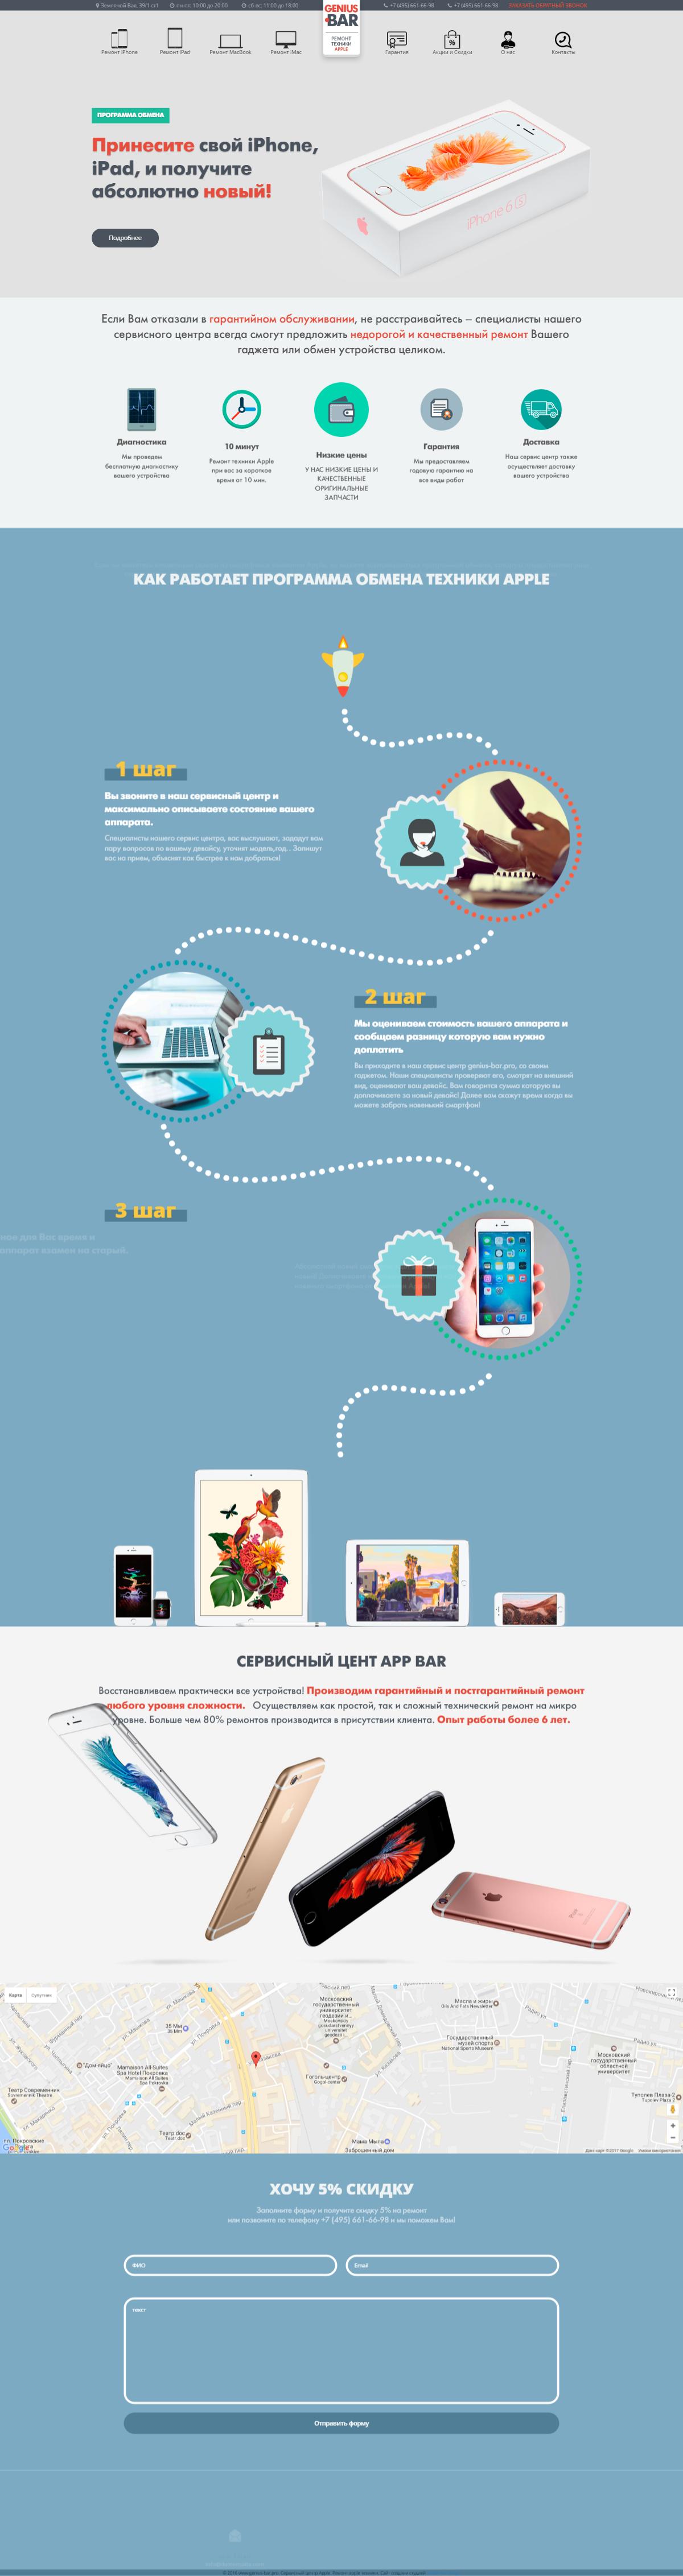 "Сайт визитка - Ремонт техники Apple ""GENIUS BAR"""